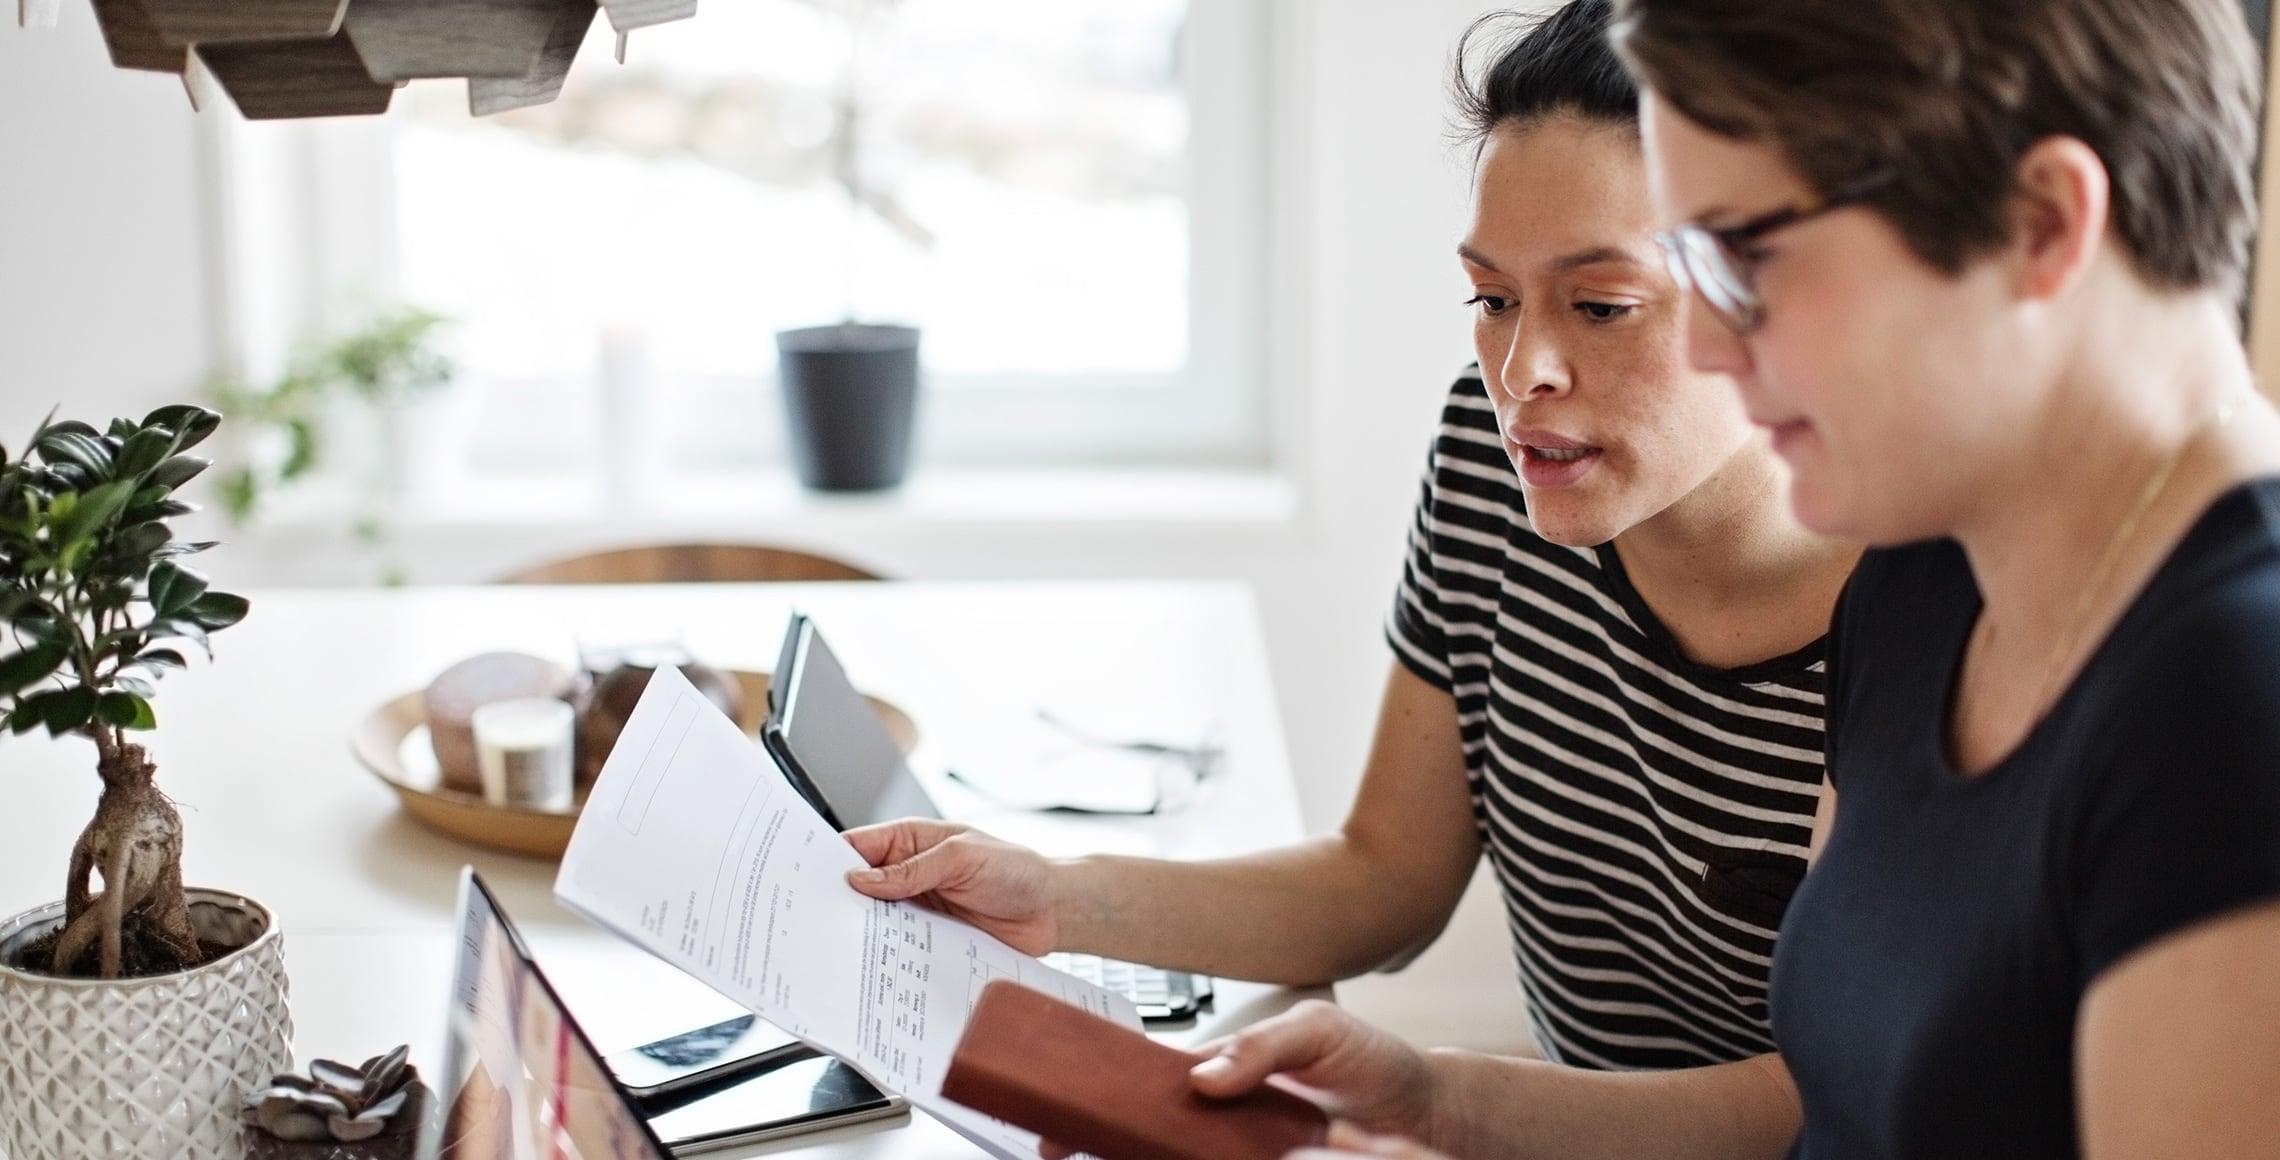 Digital transformation in insurance: 4 tips for delivering instant policyholder service